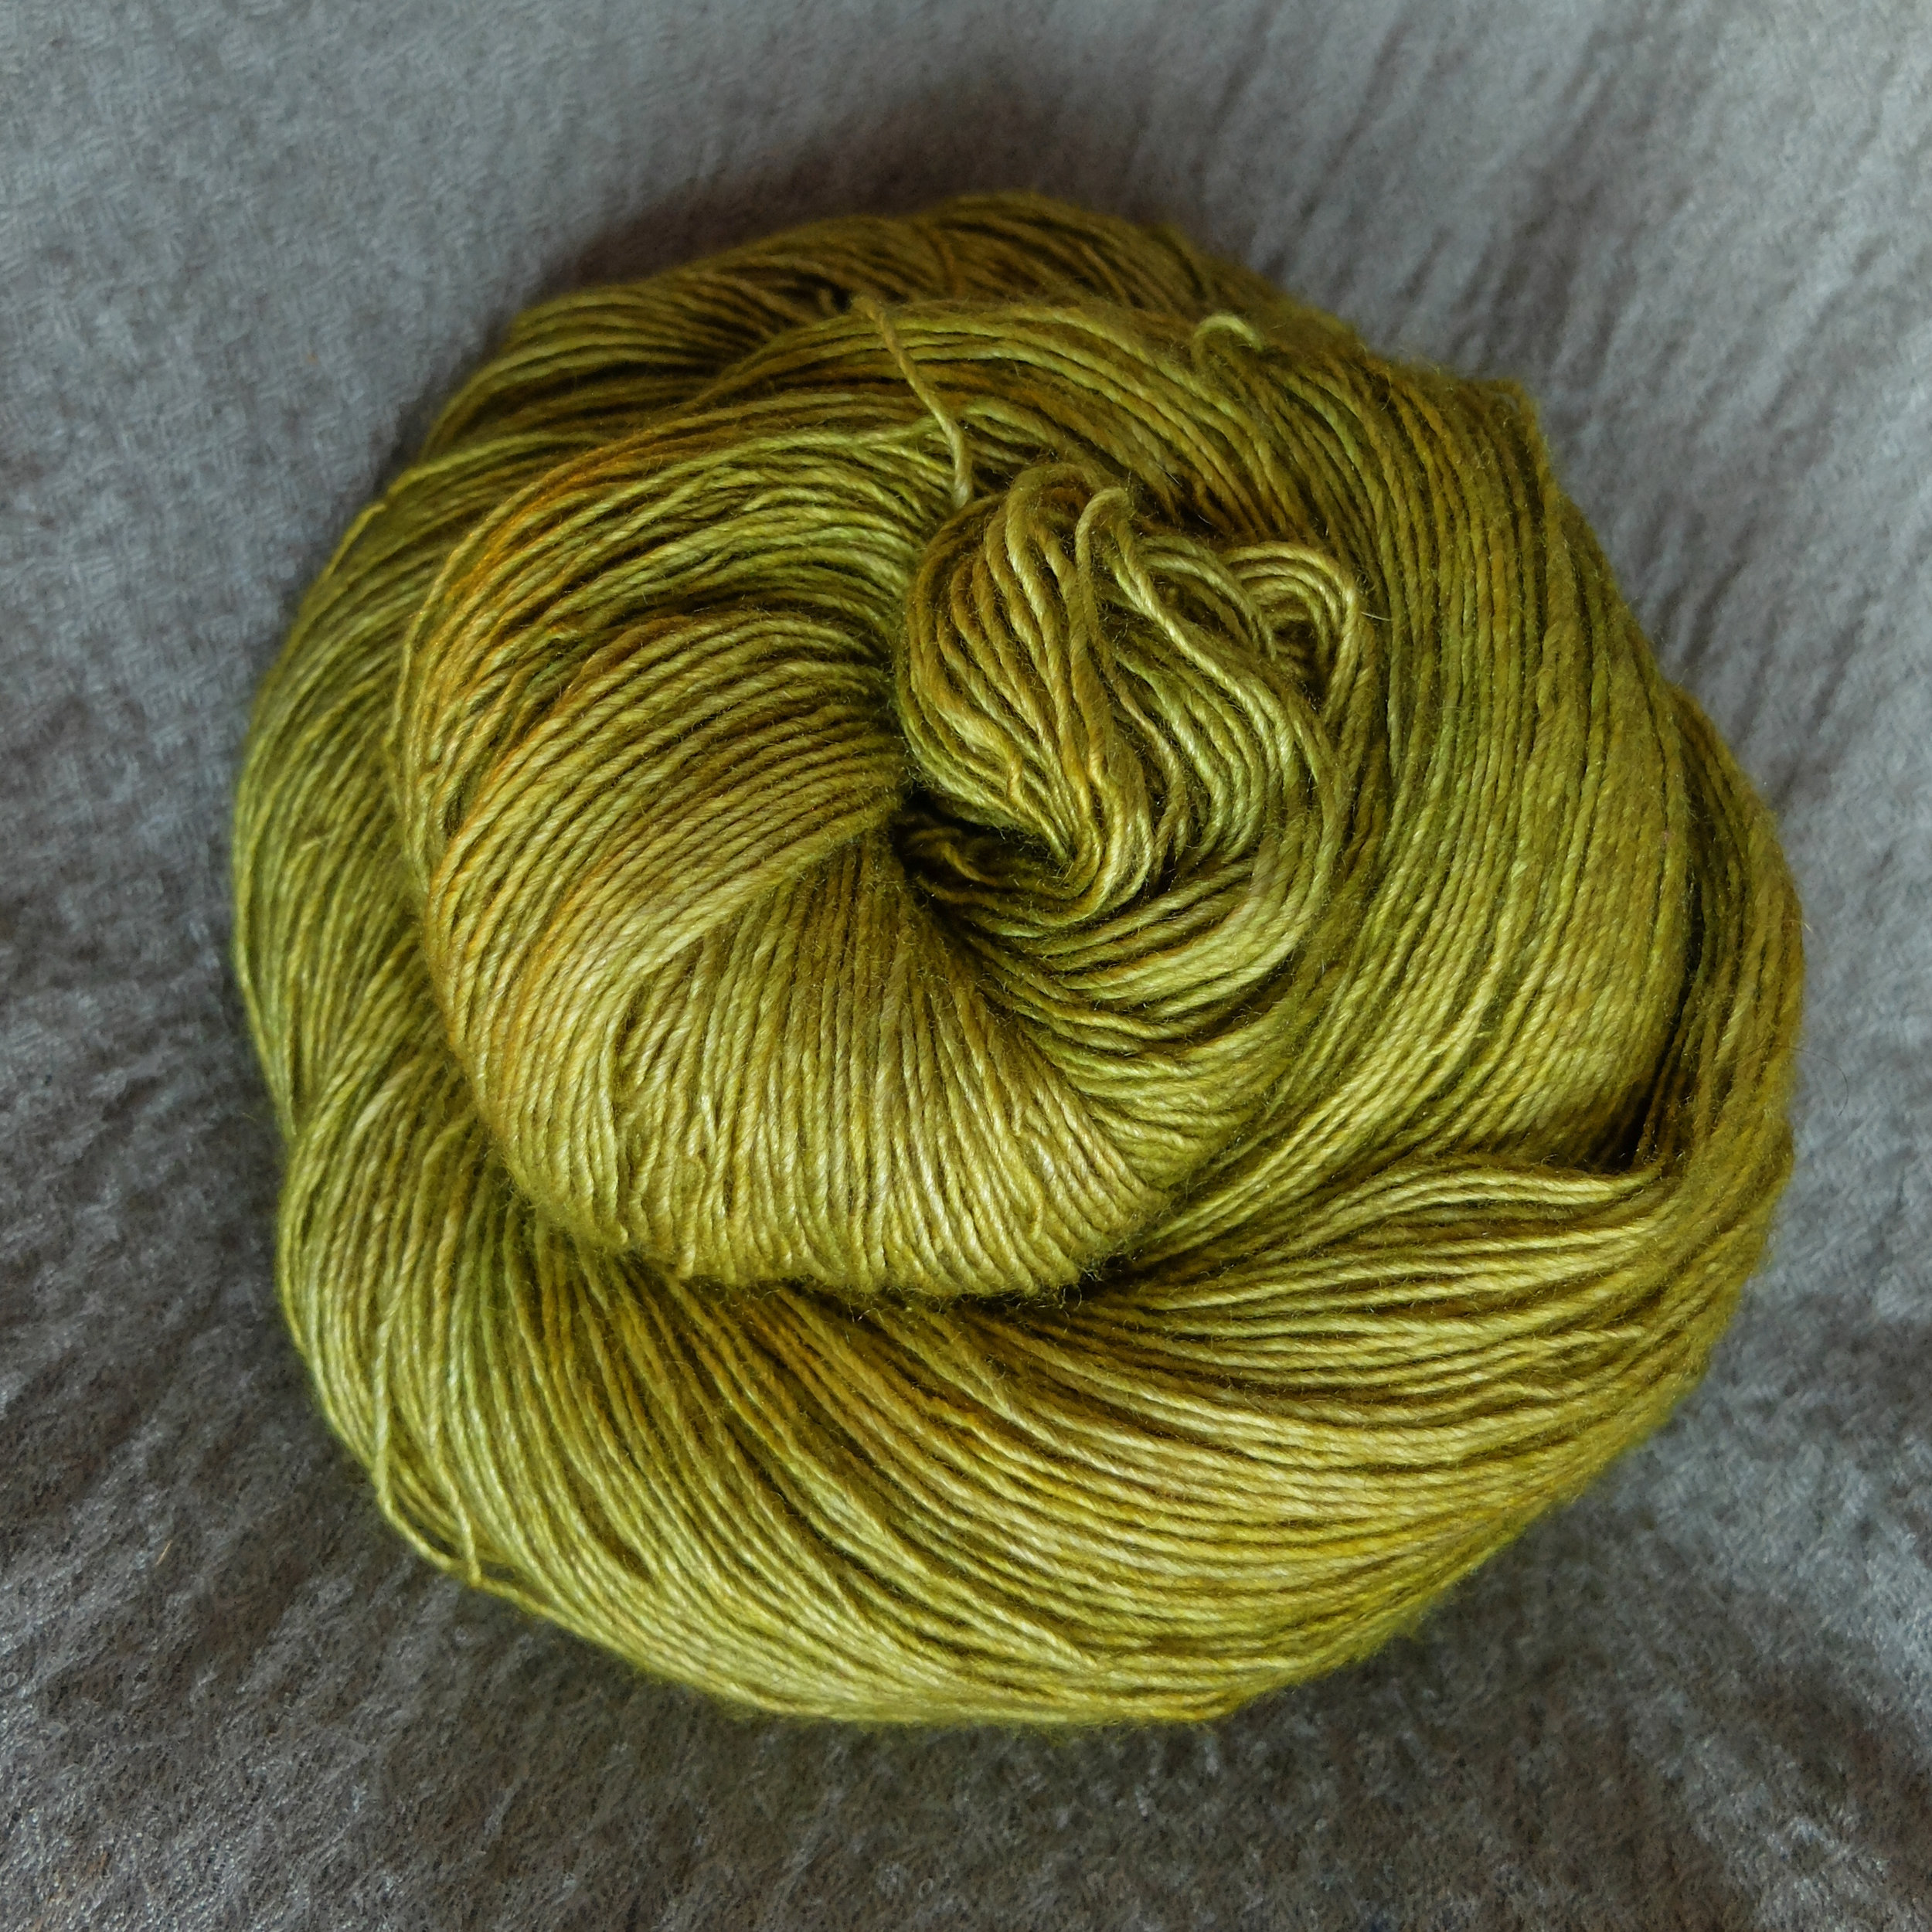 Freyr shown on Singles - Merino/Silk/Yak